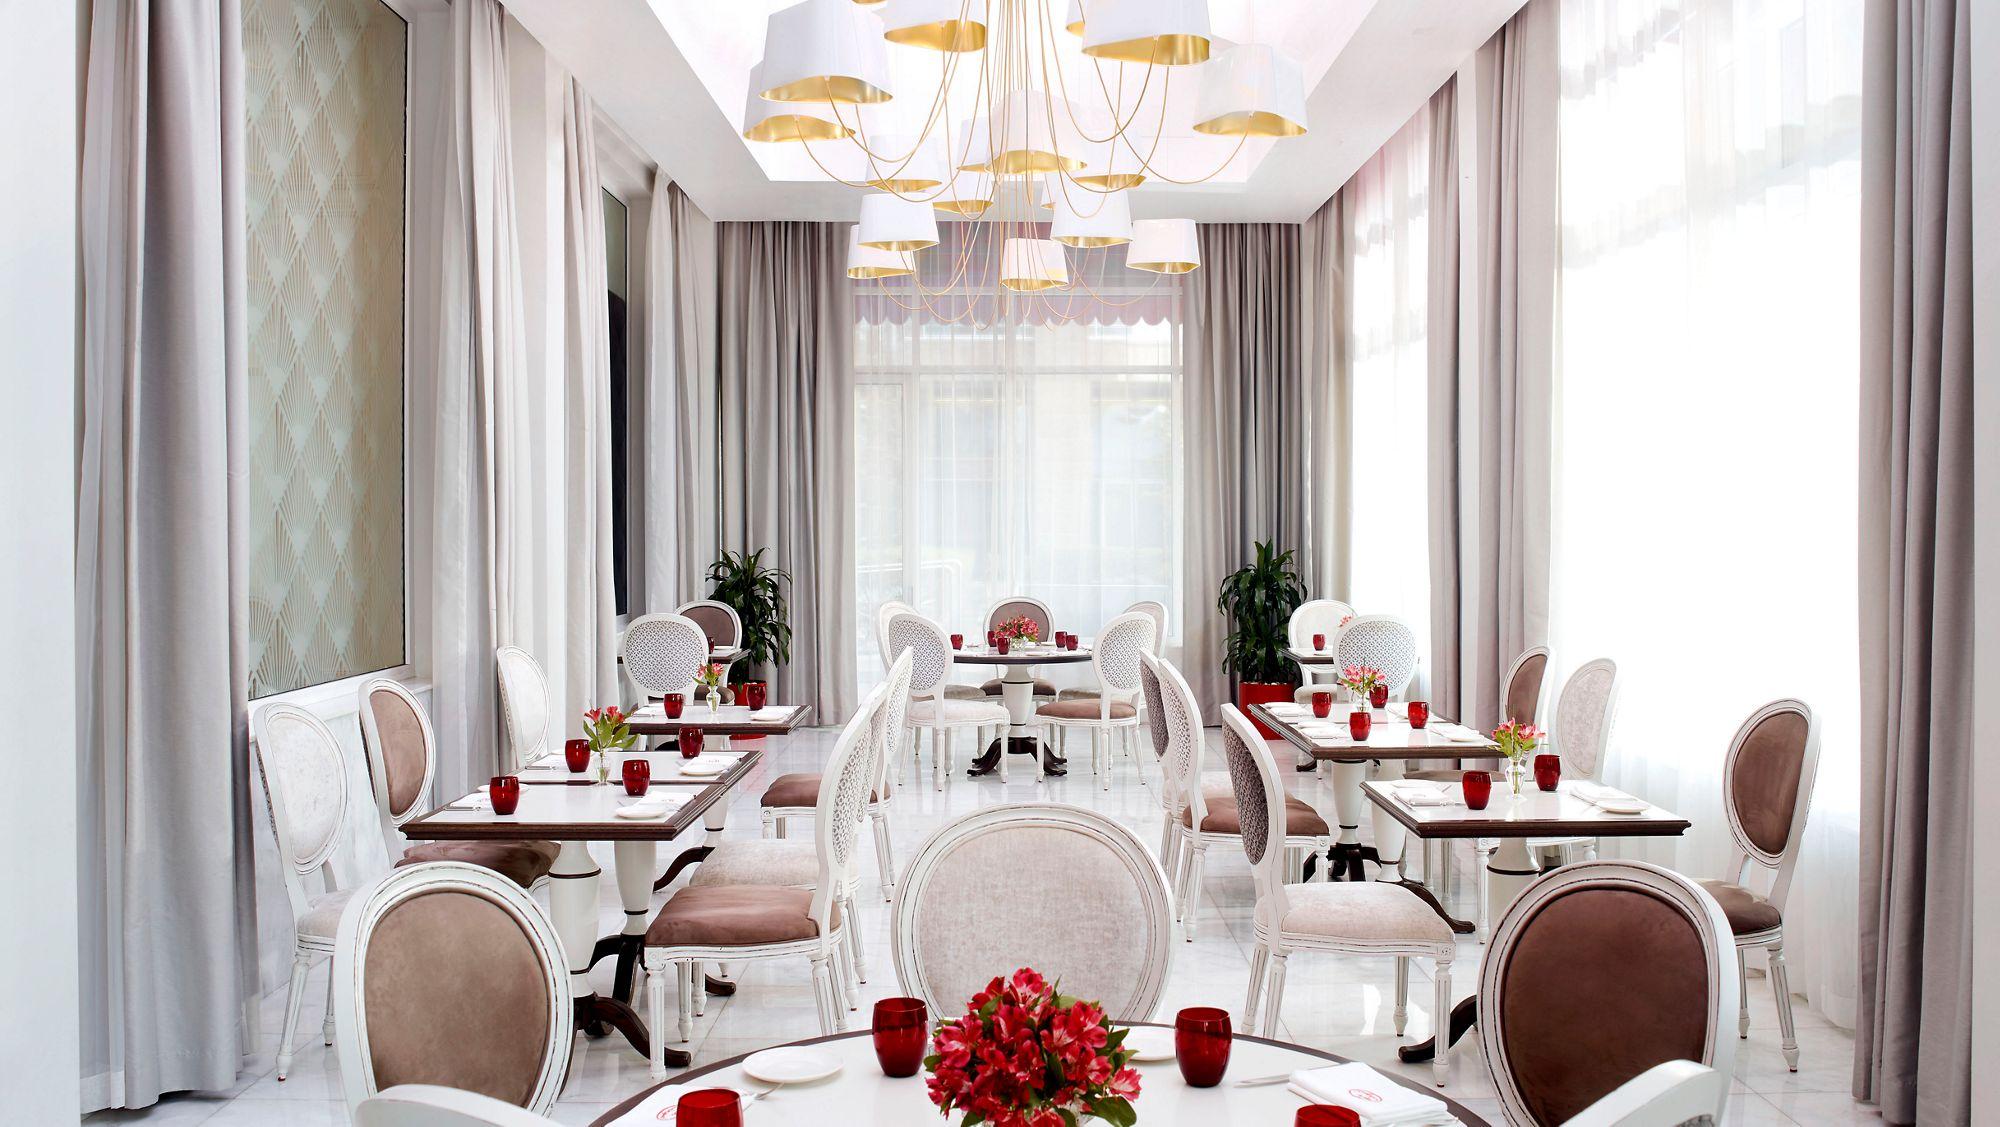 Bar Le French Flair fine dining french restaurant dubai   le cirque